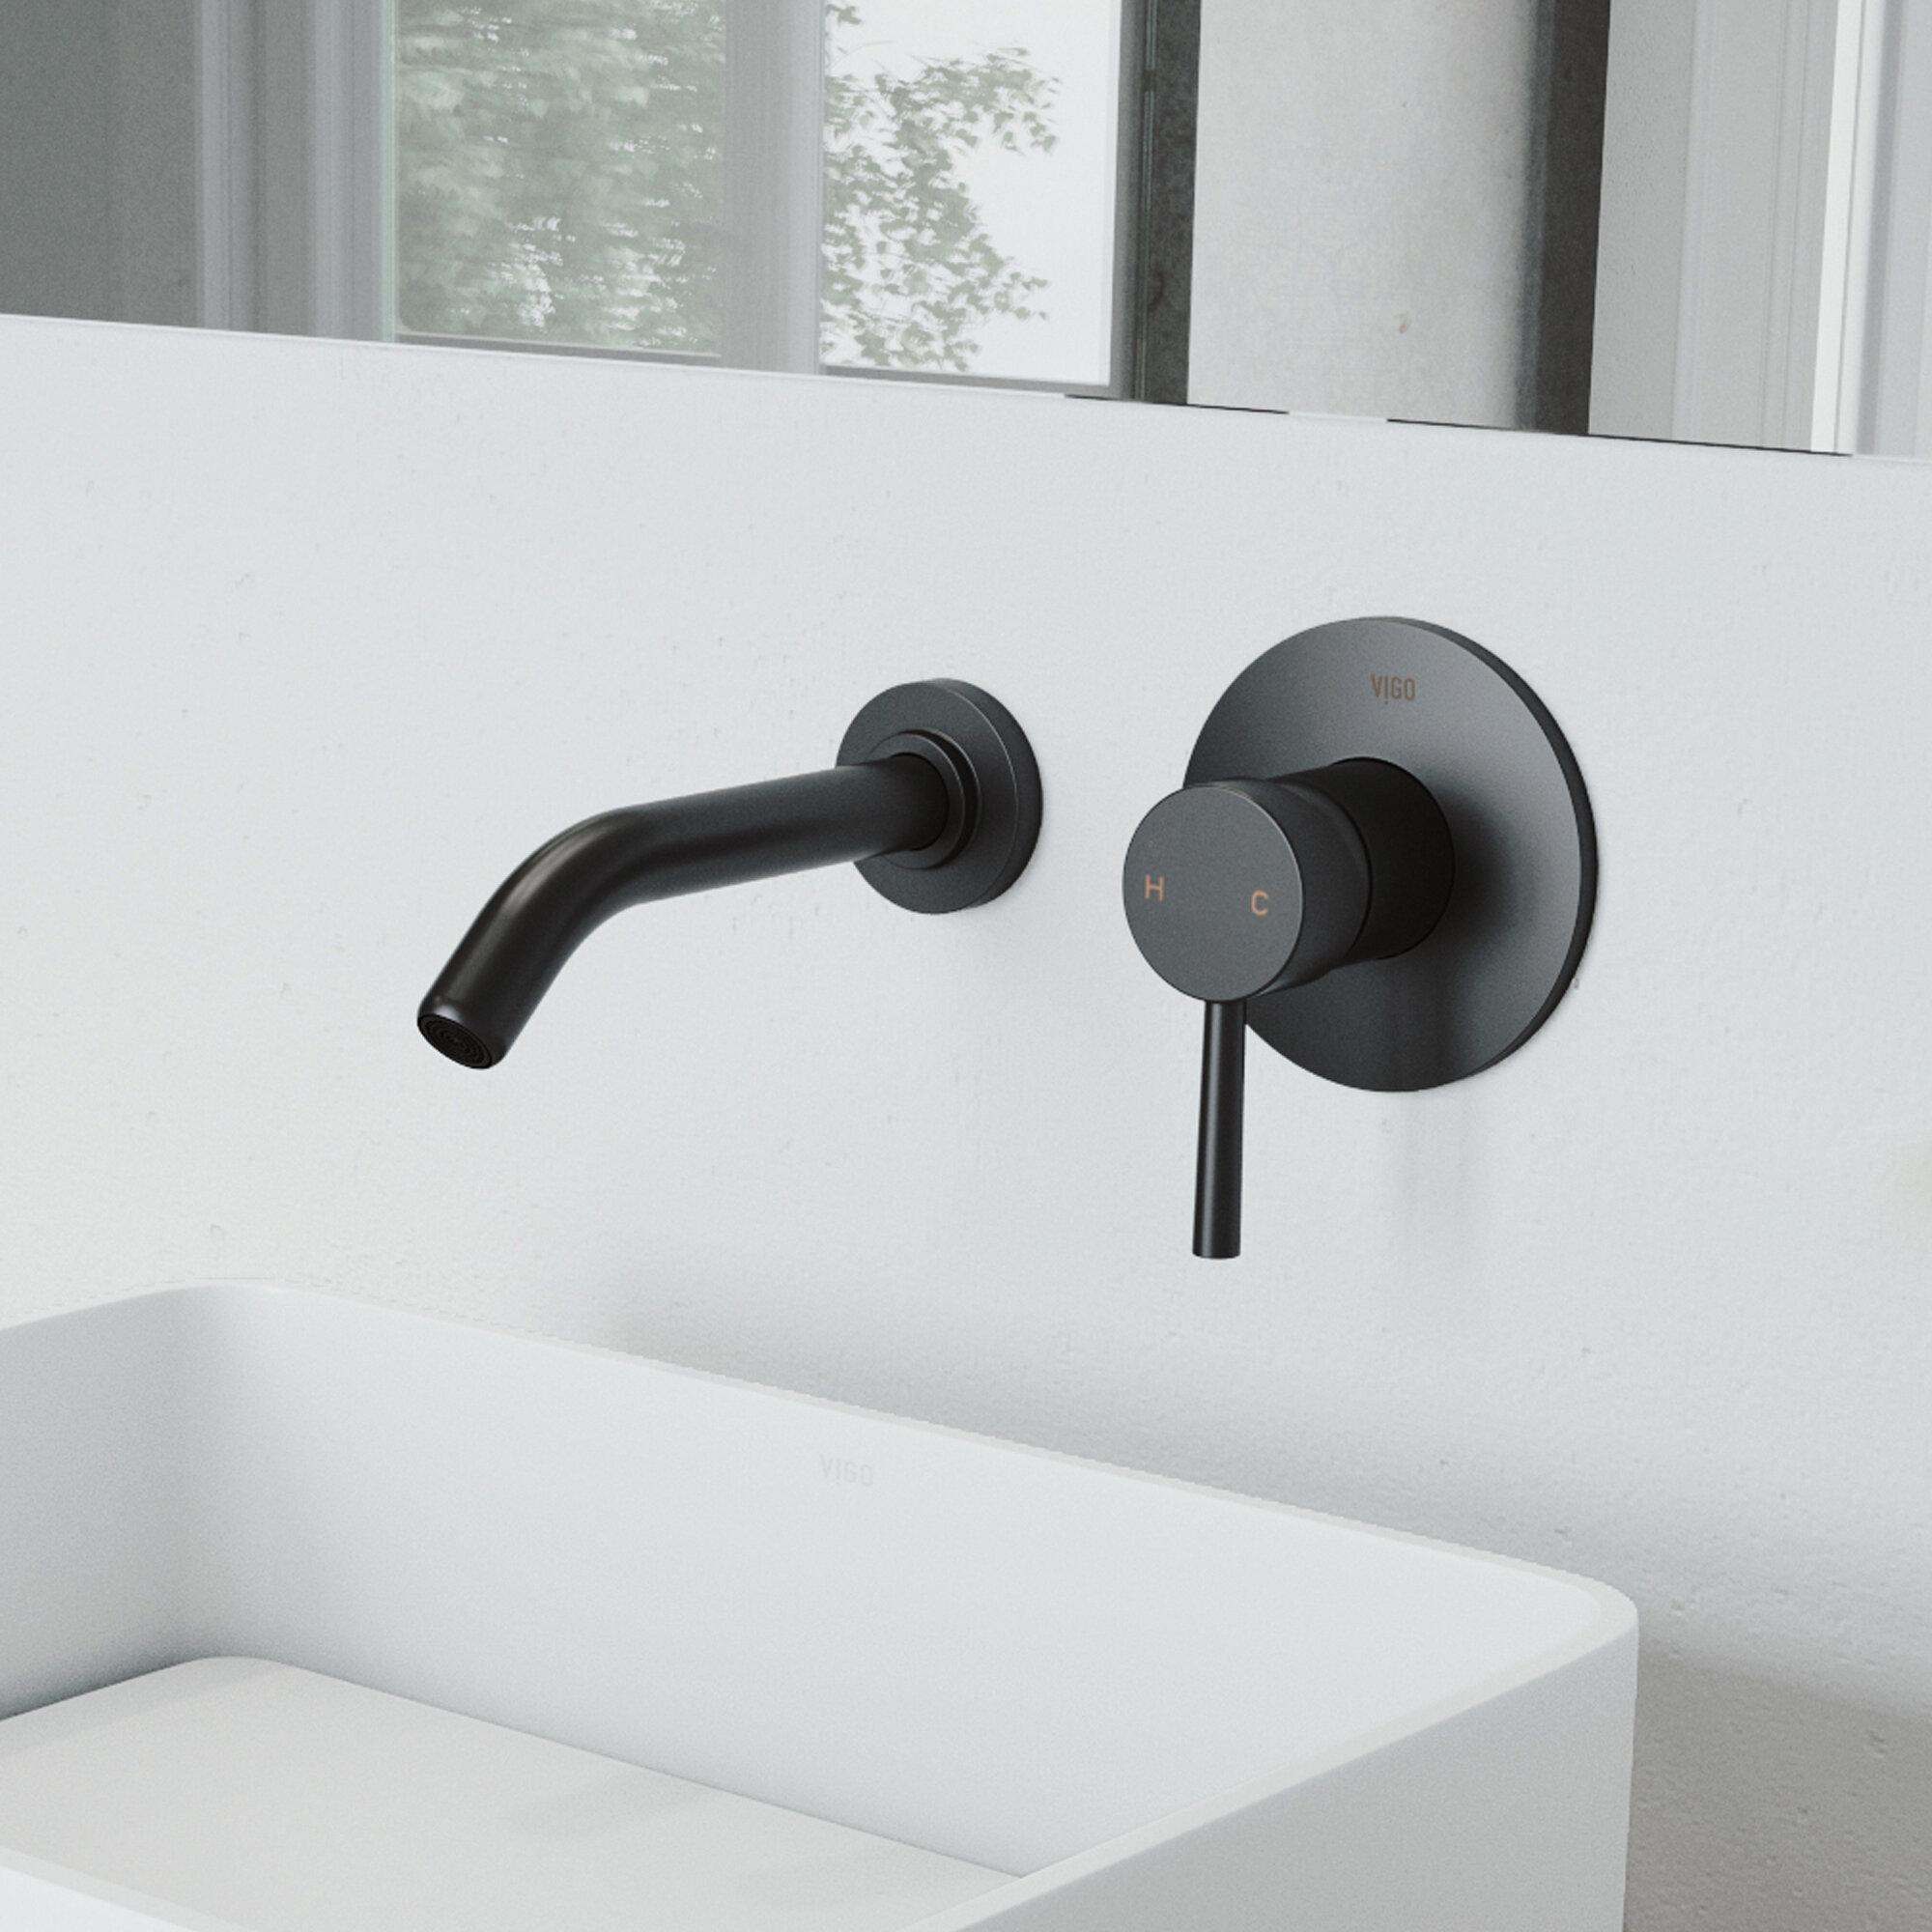 Vigo Olus Wall Mounted Bathroom Faucet Reviews Wayfair